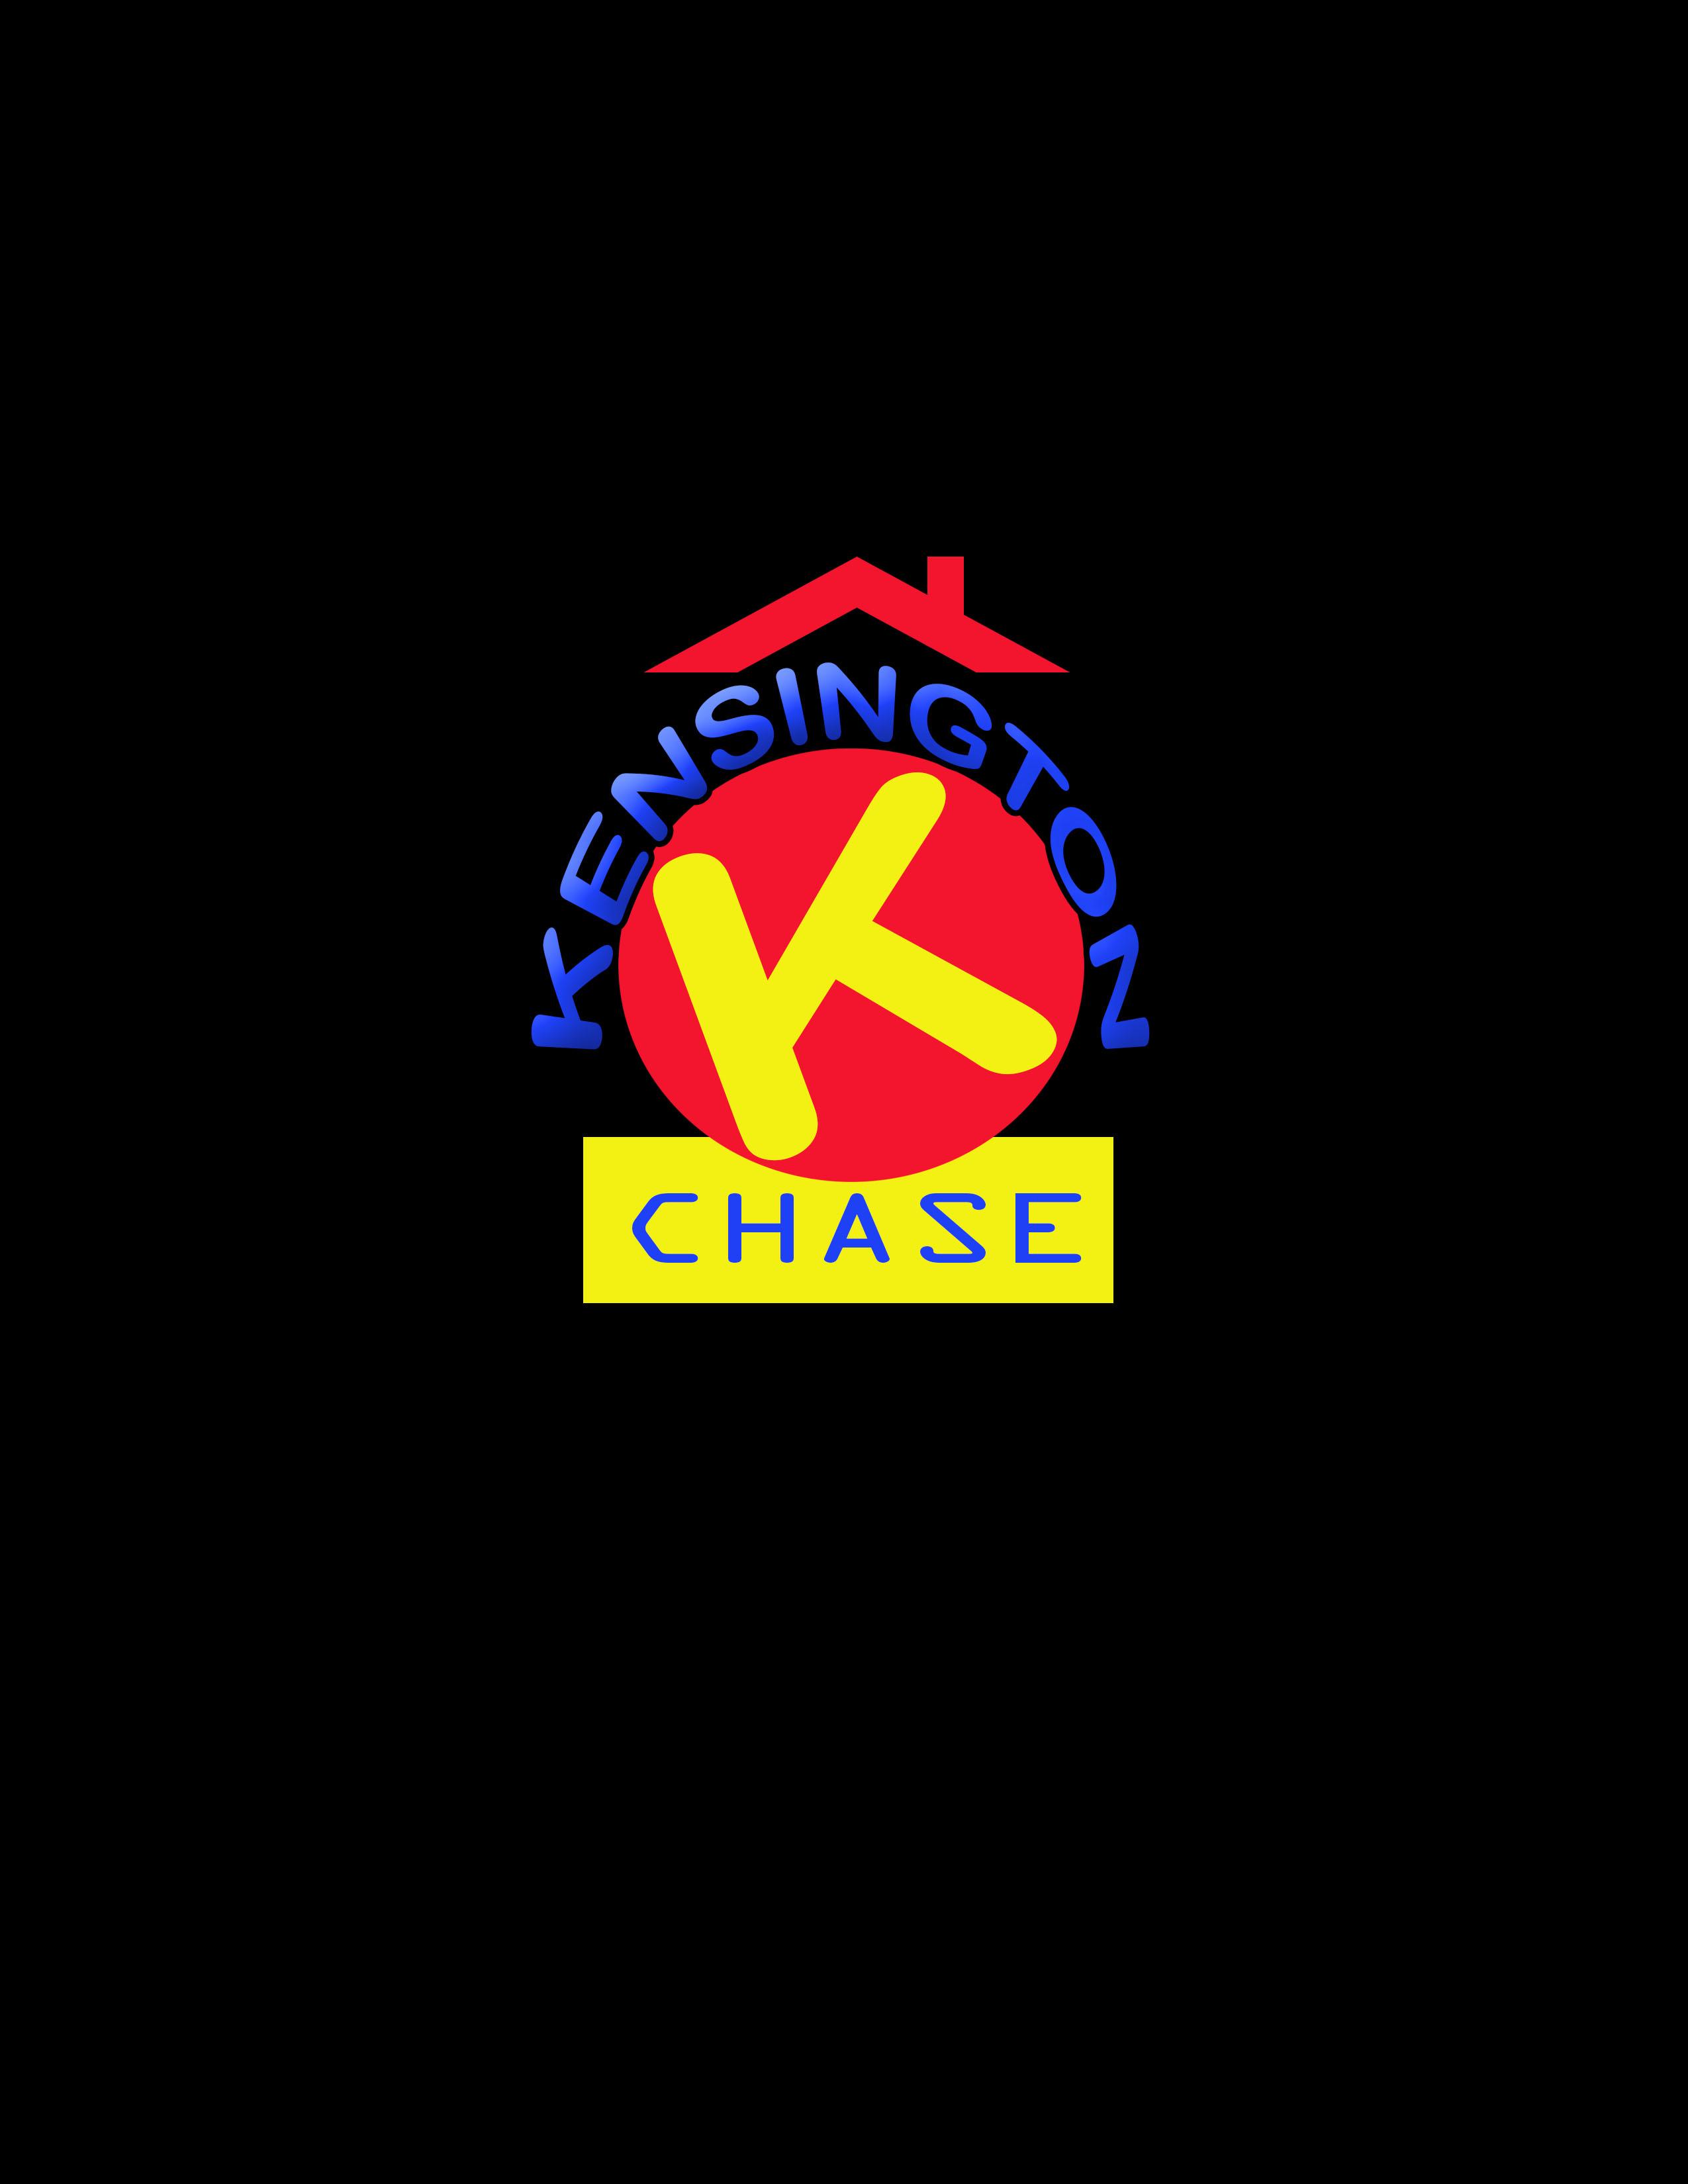 Logo Design by kjm22 - Entry No. 140 in the Logo Design Contest Kensington Chase  Logo Design.